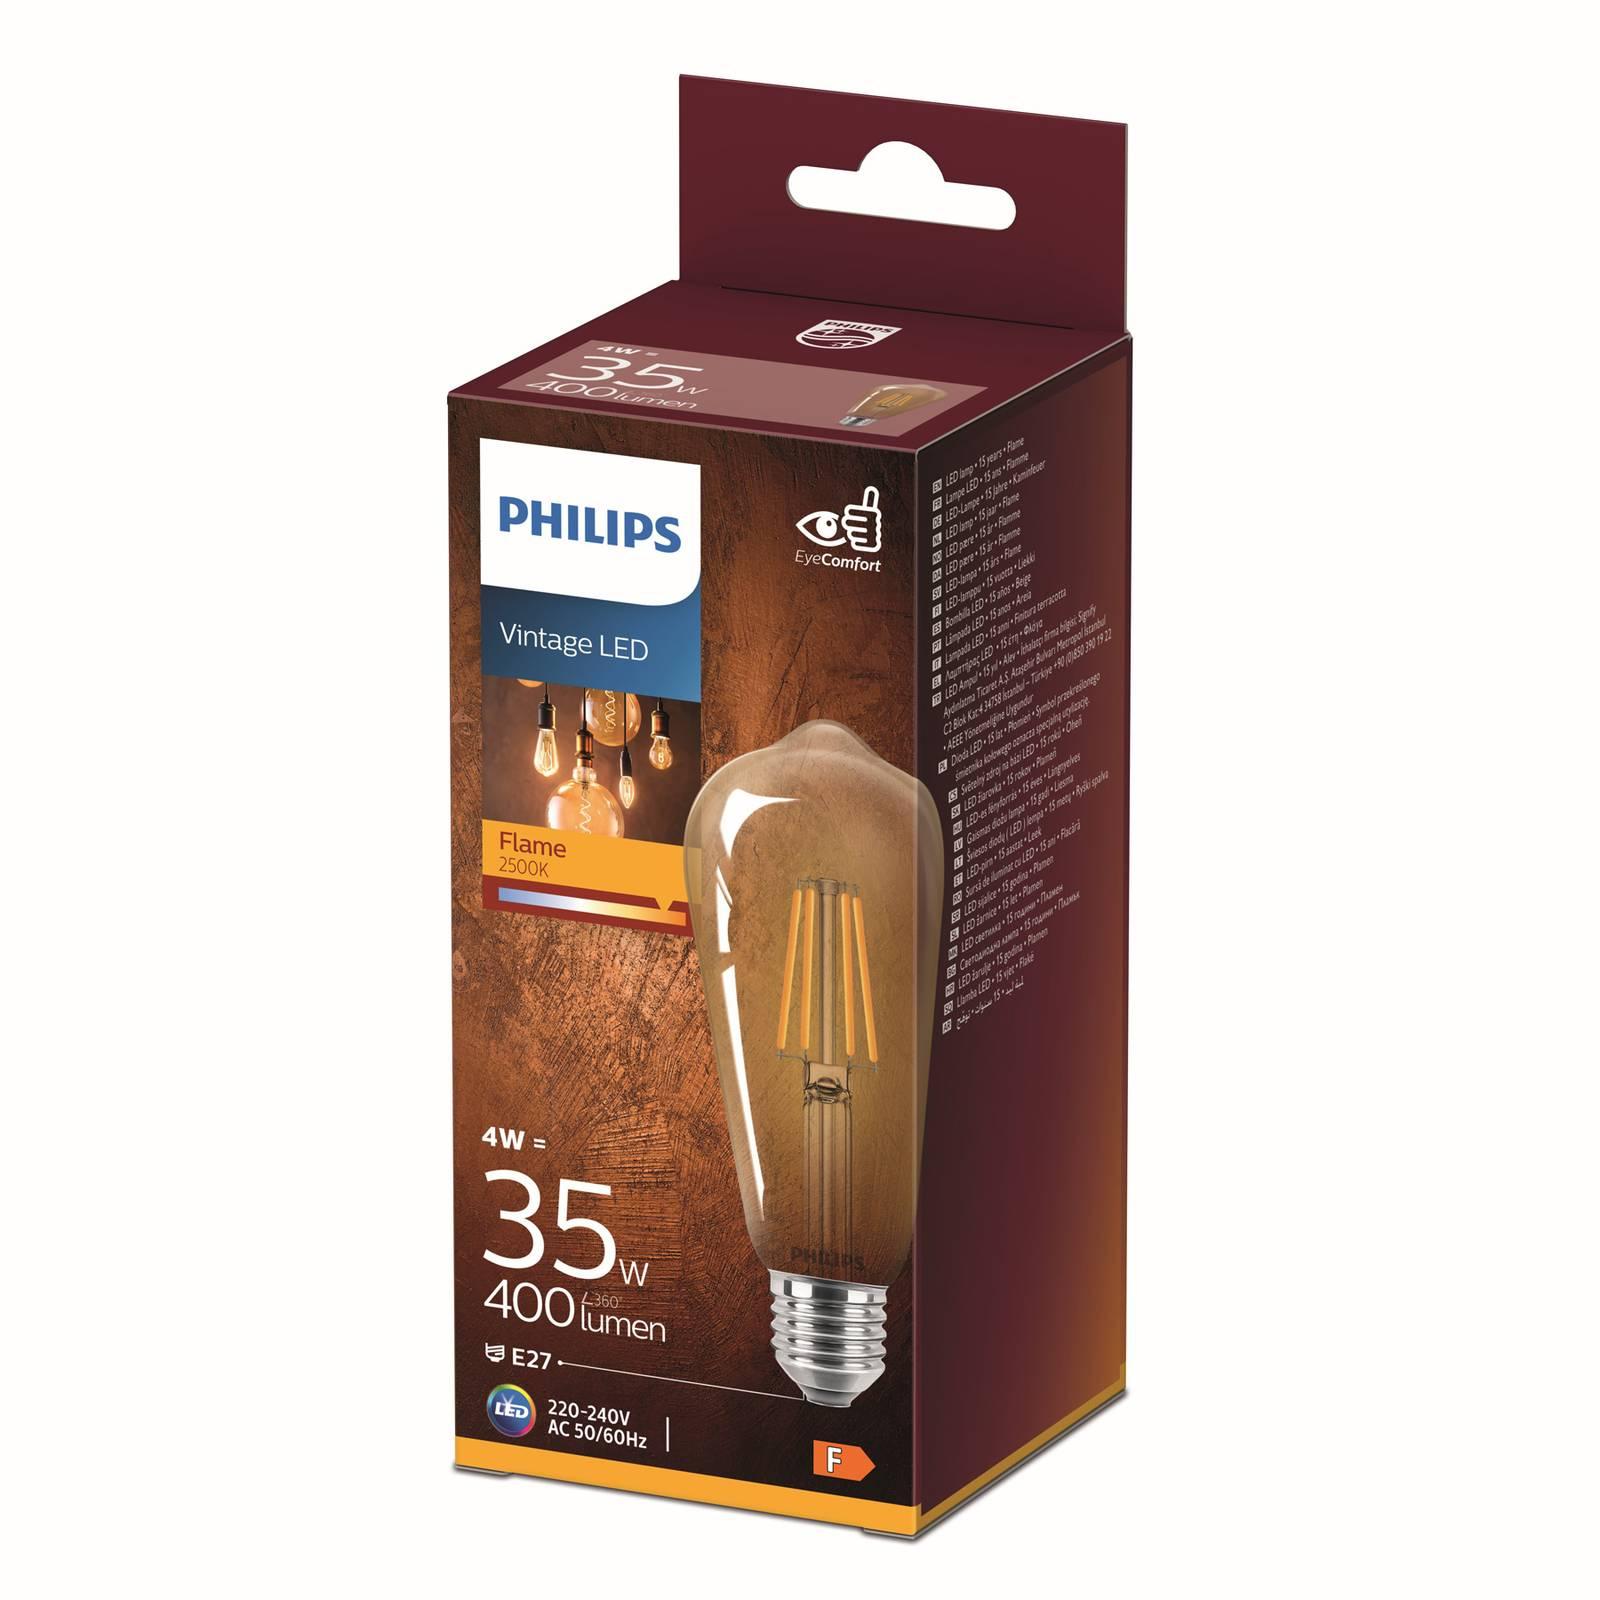 Philips E27 ST64 -LED-lamppu Curved 4W 2 500 K